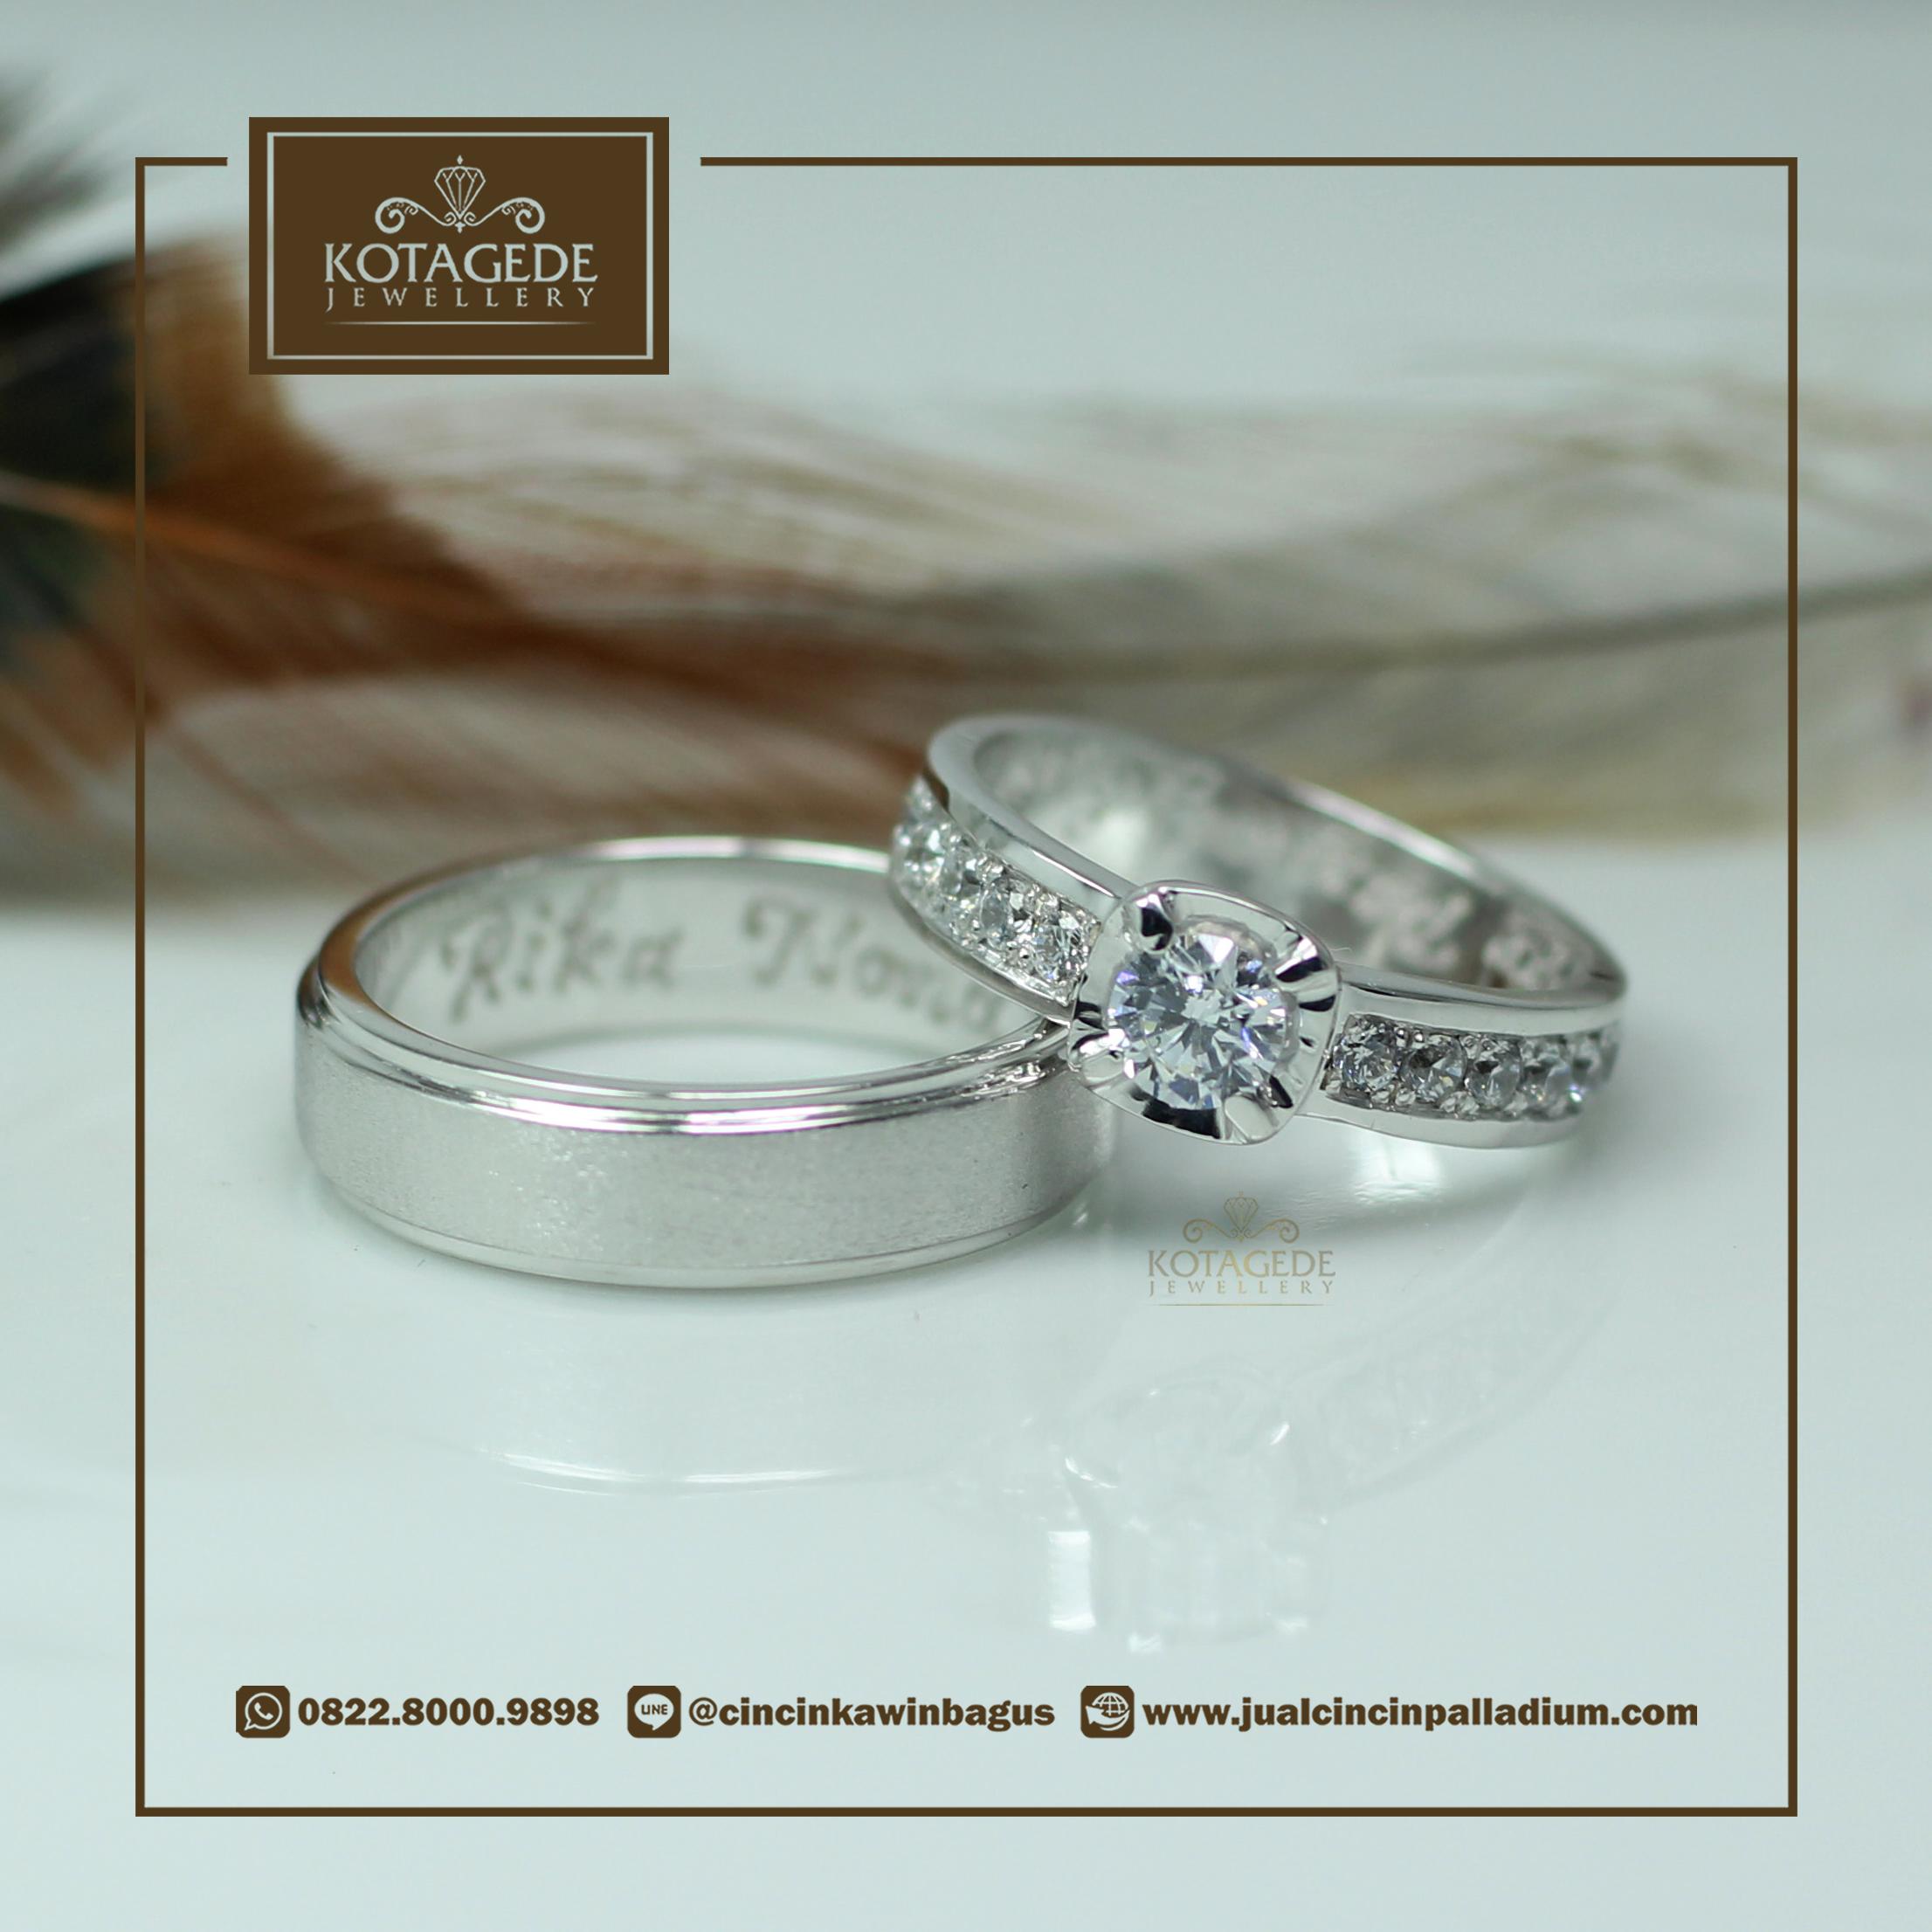 300+ Gambar Cincin Tunangan Emas Putih HD Paling Baru